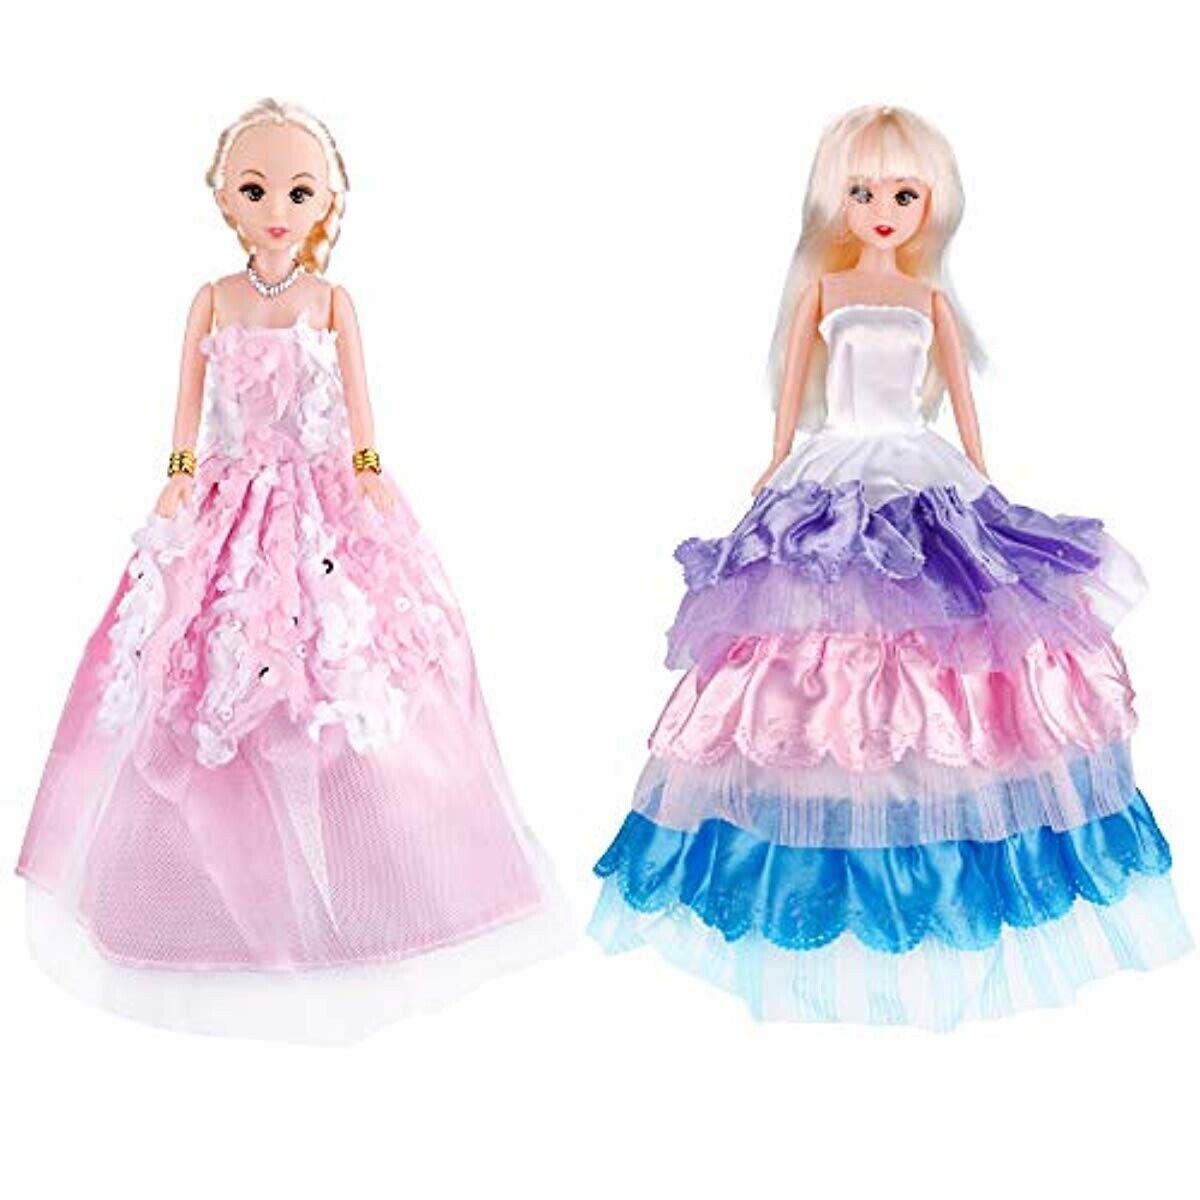 73PCS Barbie Doll Clothes Party Gown Shoes Bag Necklace Hanger Doll Accessories 4